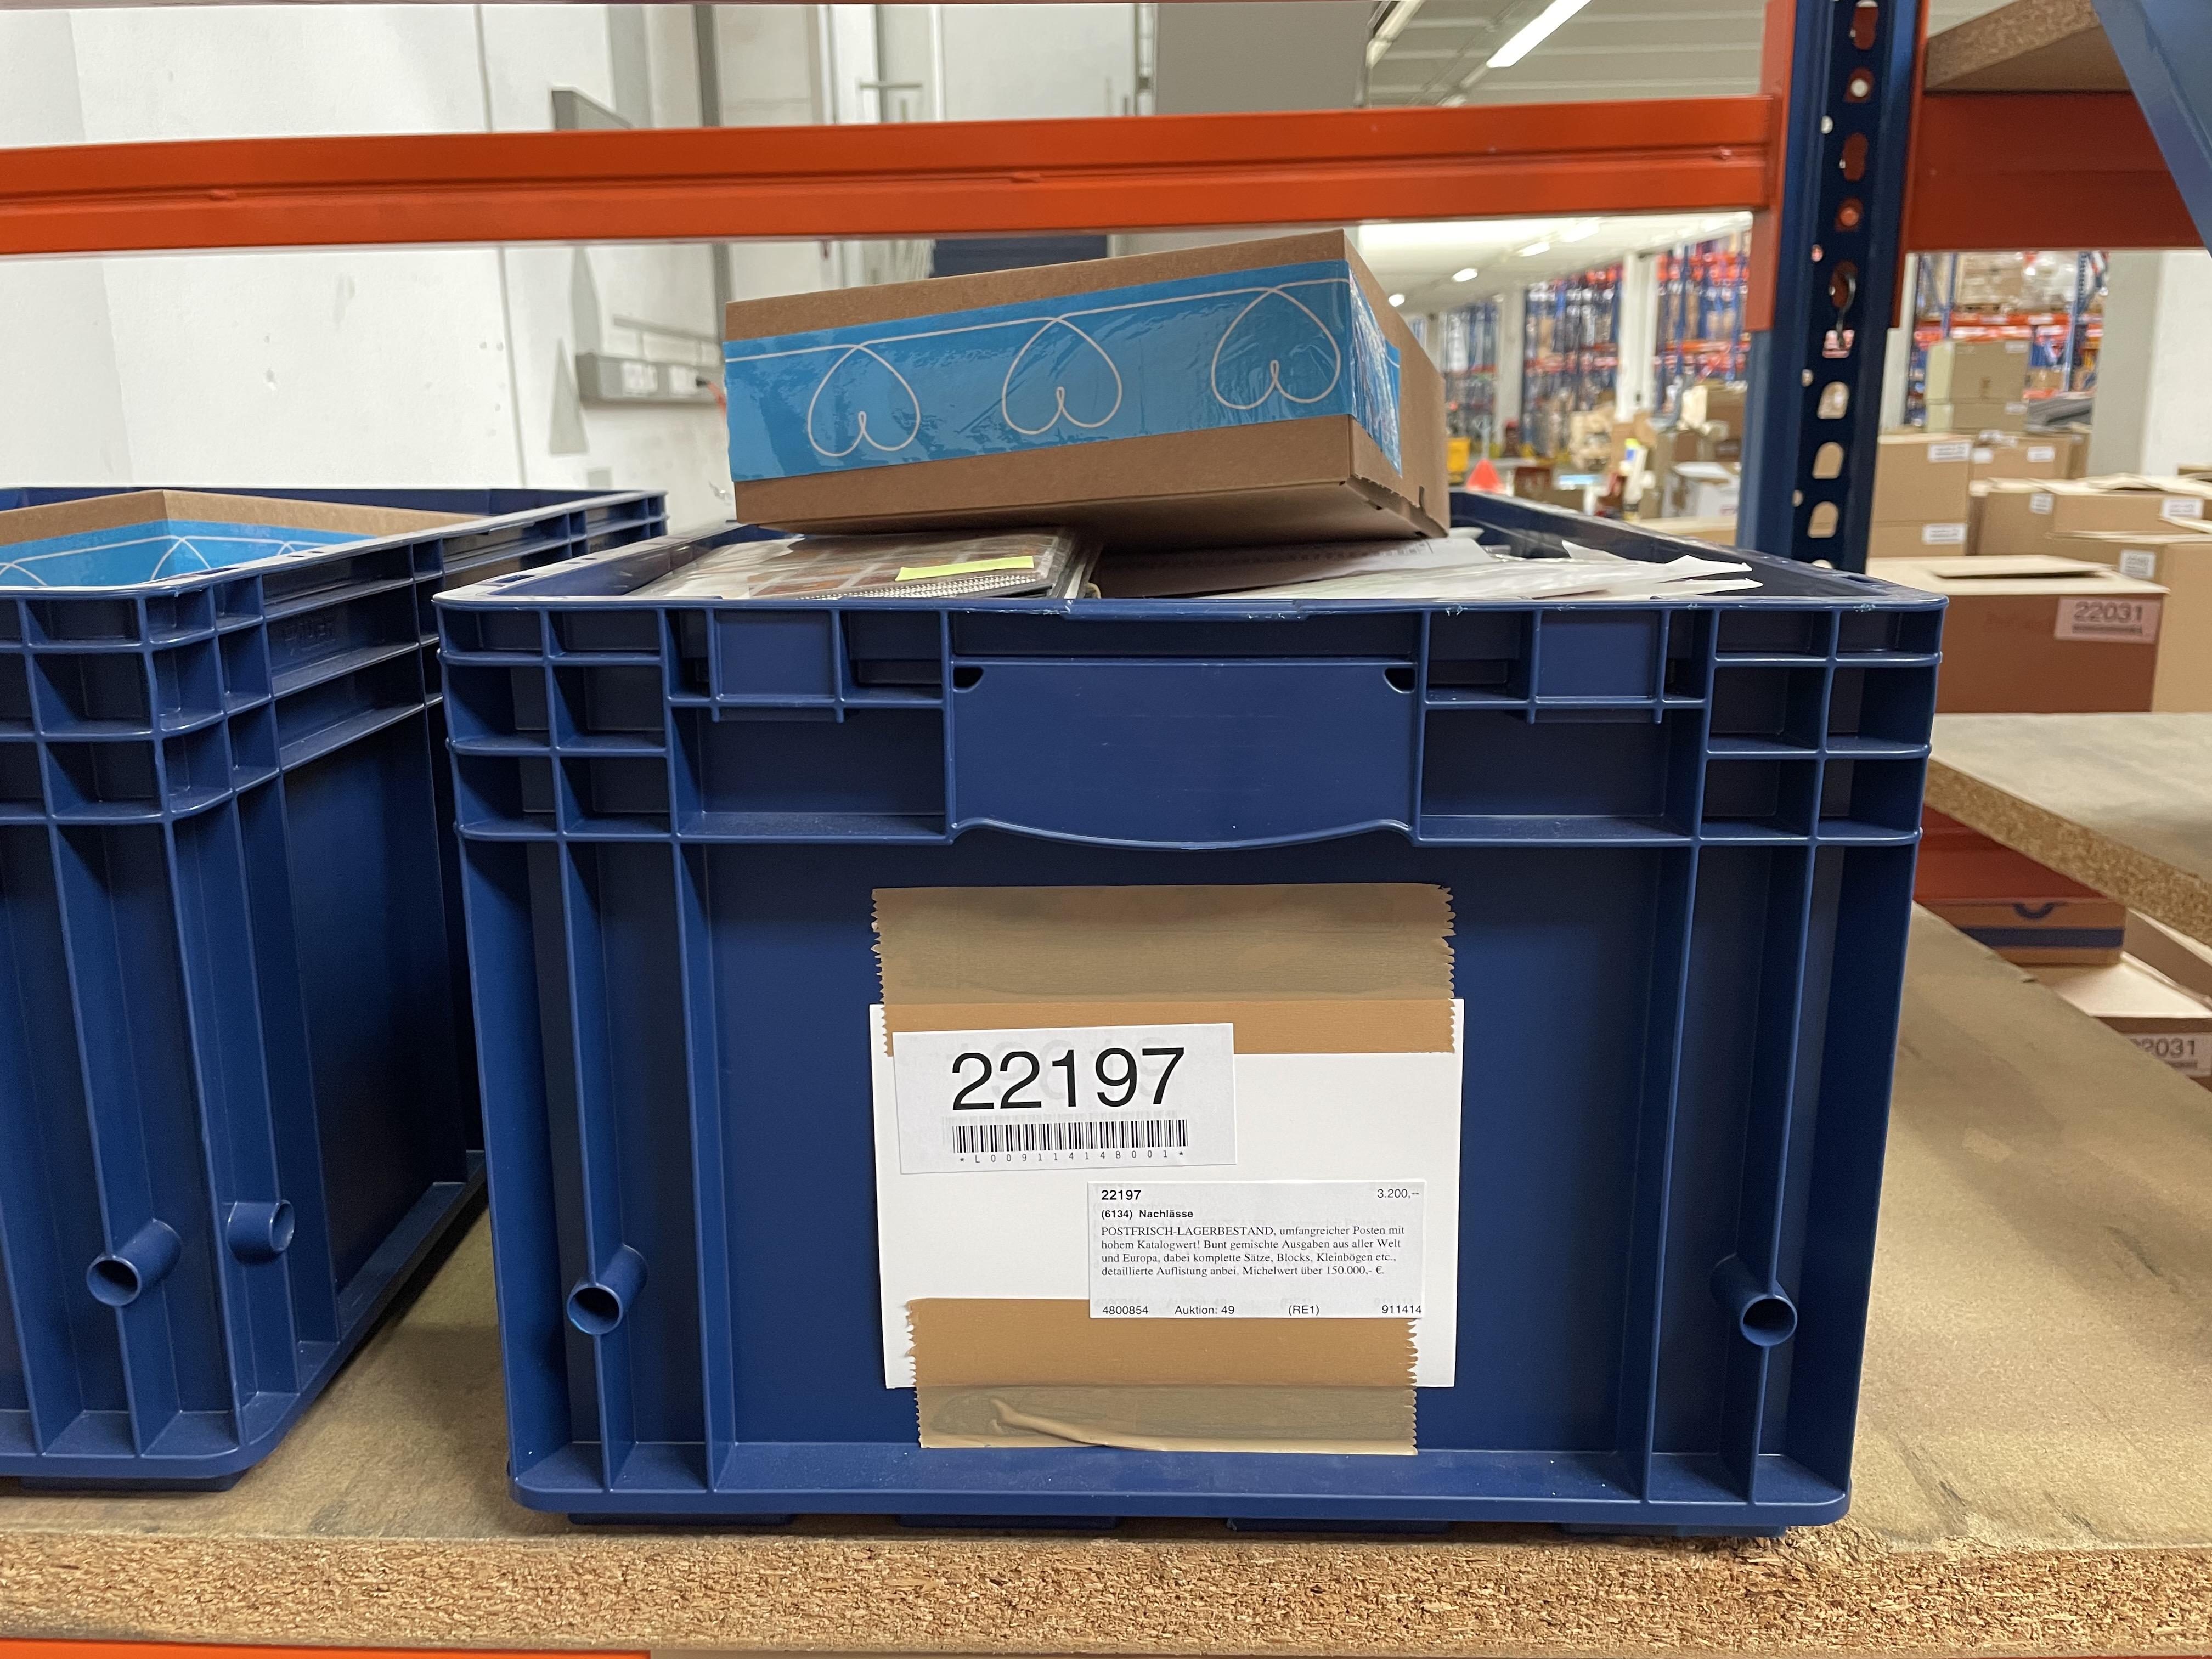 Lot 22197 - nachlässe  -  Auktionshaus Christoph Gärtner GmbH & Co. KG Sale #49 Collections Overseas, Thematics, Europe, Germany/Estates